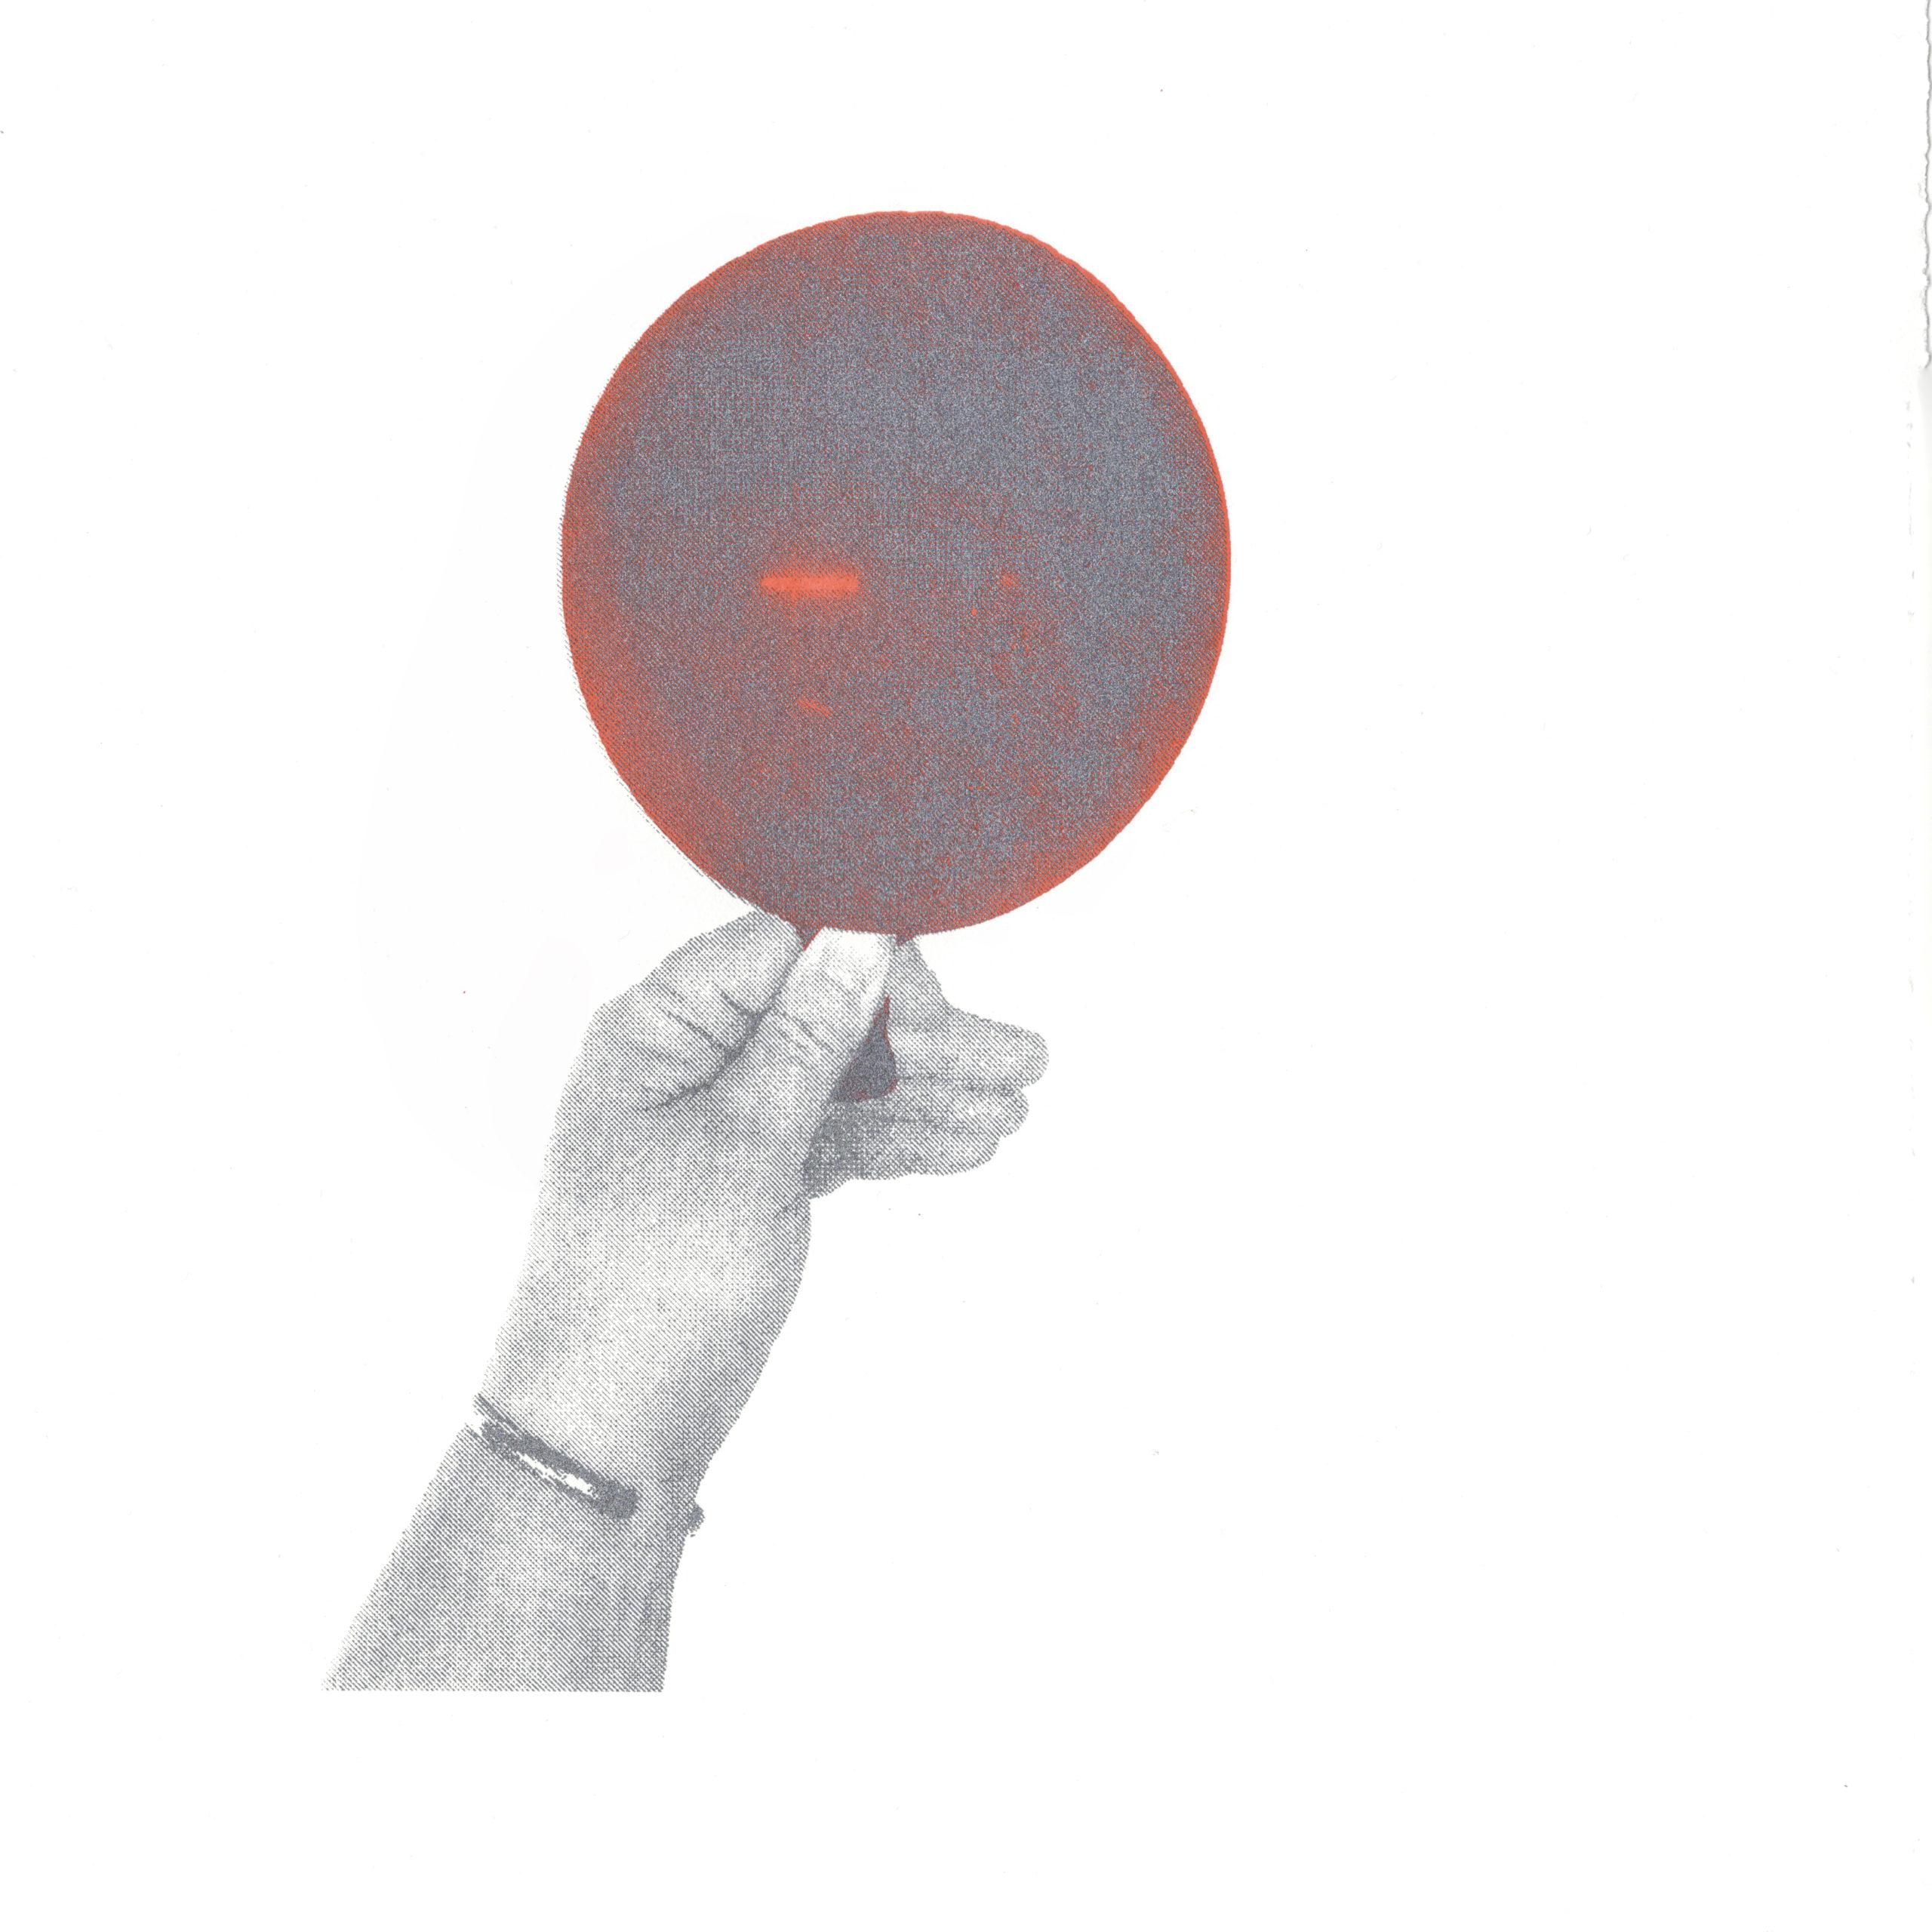 Summer Ventis, Held Breaths I, screen print, 10 x 8 in